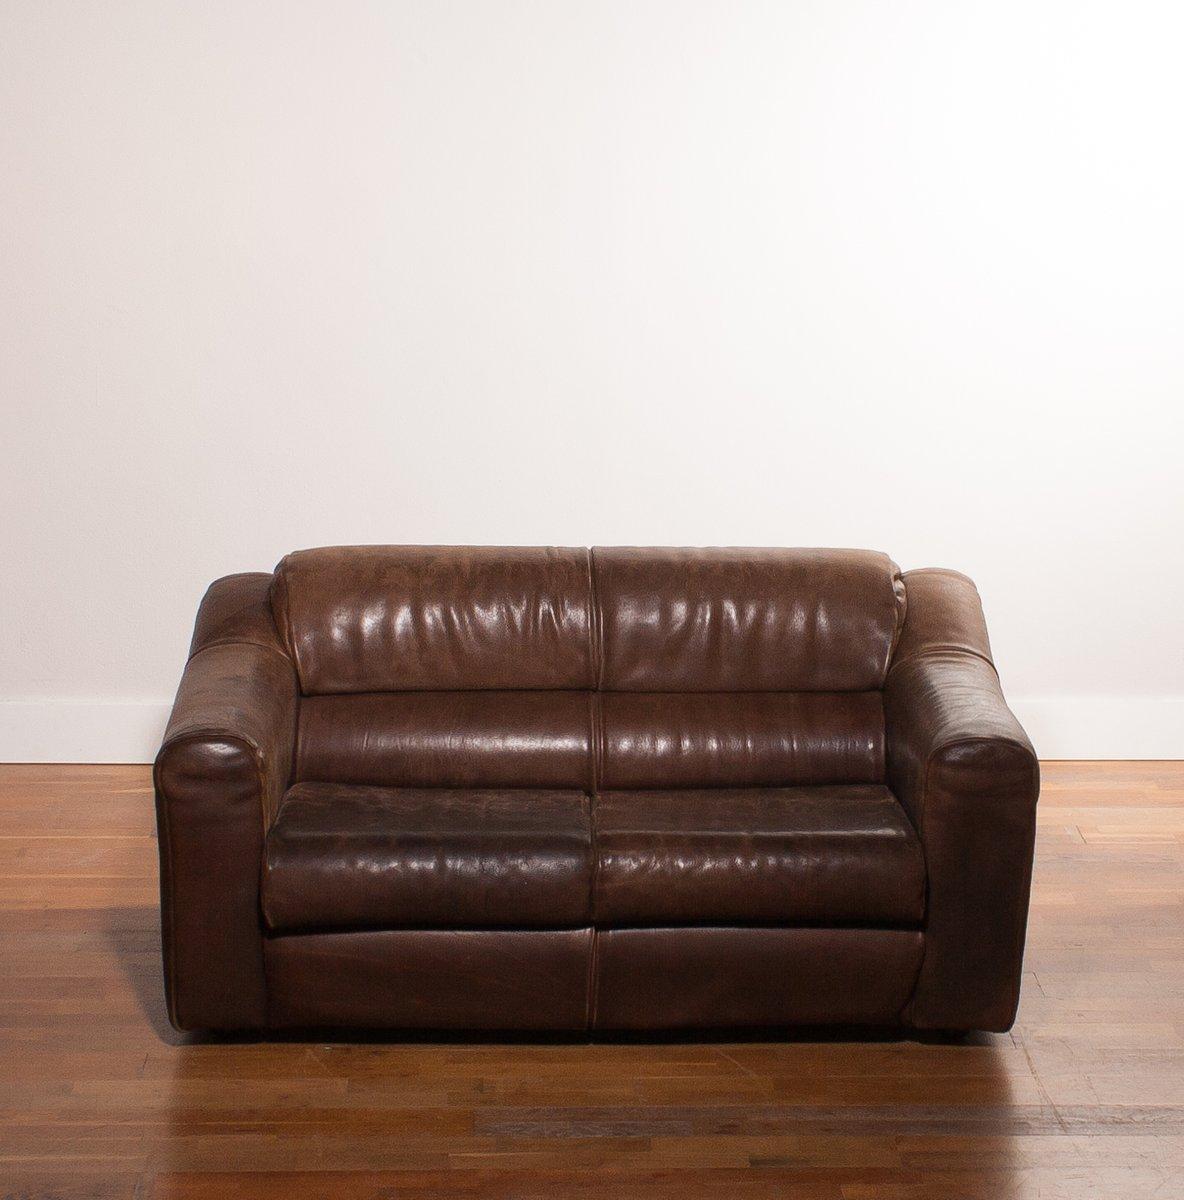 canap 2 places en cuir de buffle 1970s en vente sur pamono. Black Bedroom Furniture Sets. Home Design Ideas